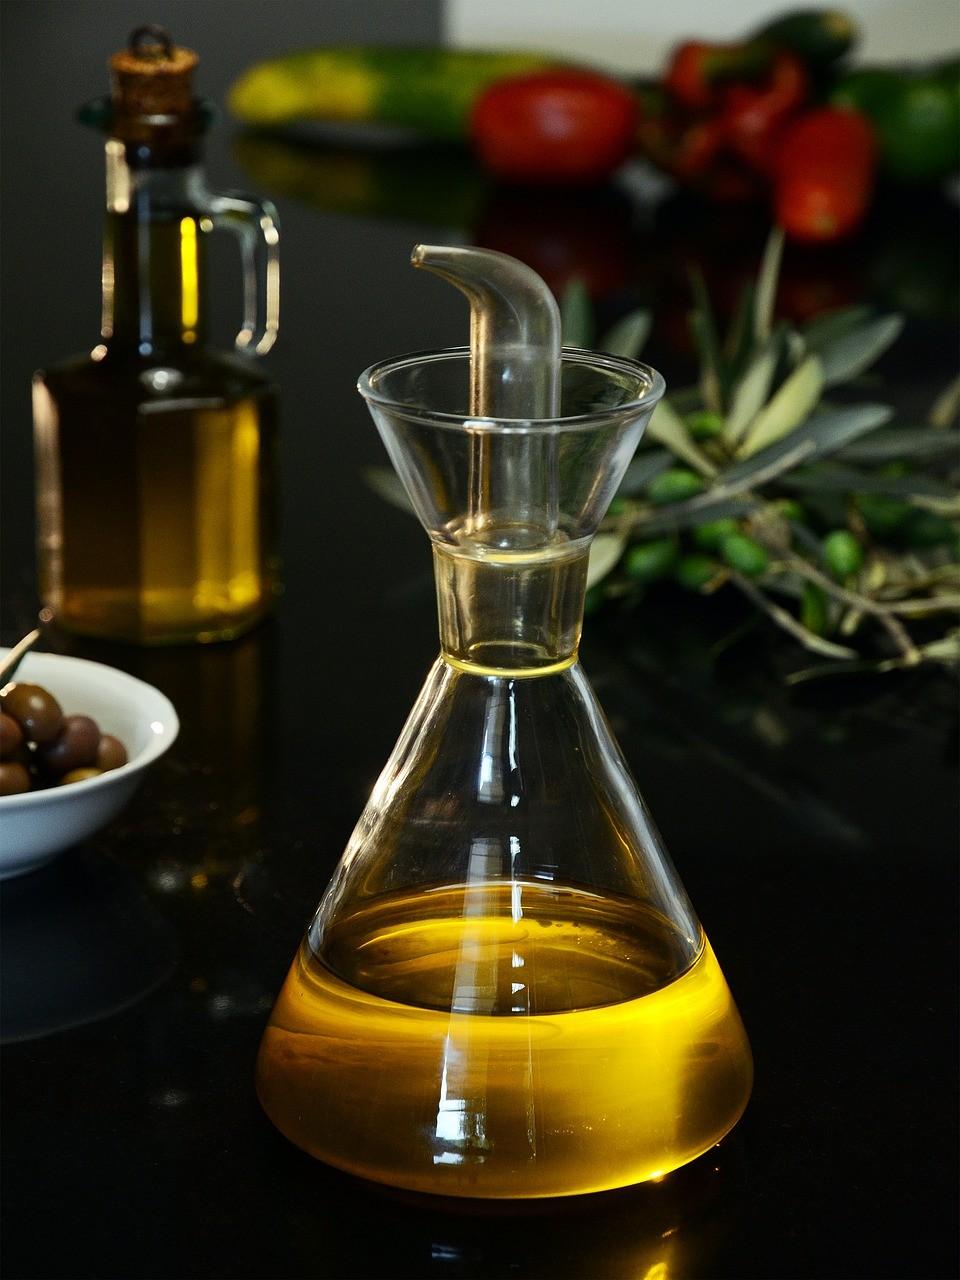 Bild: Kaltgepresstes Olivenöl